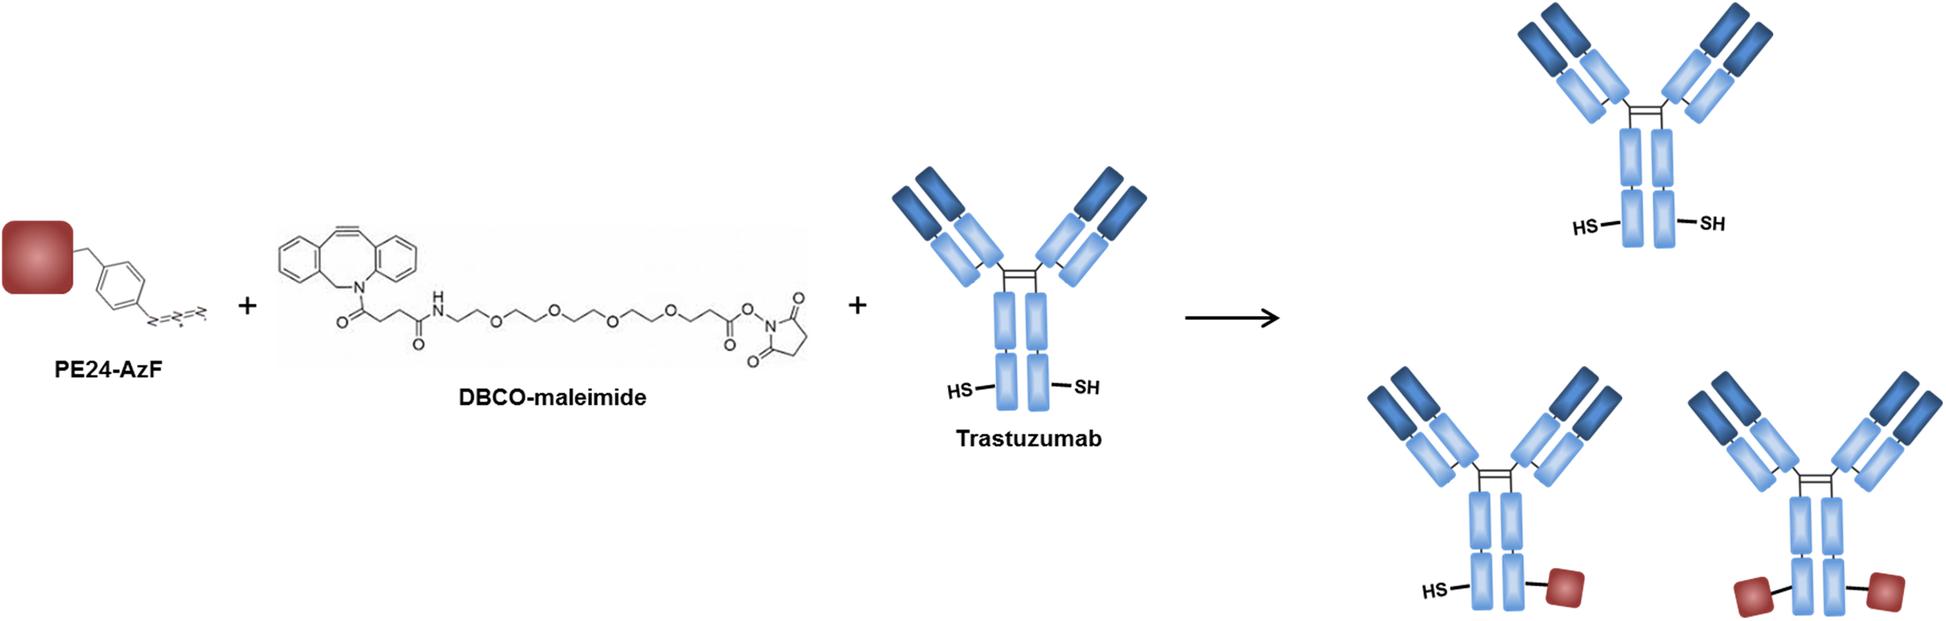 Construction of an immunotoxin via site-specific conjugation